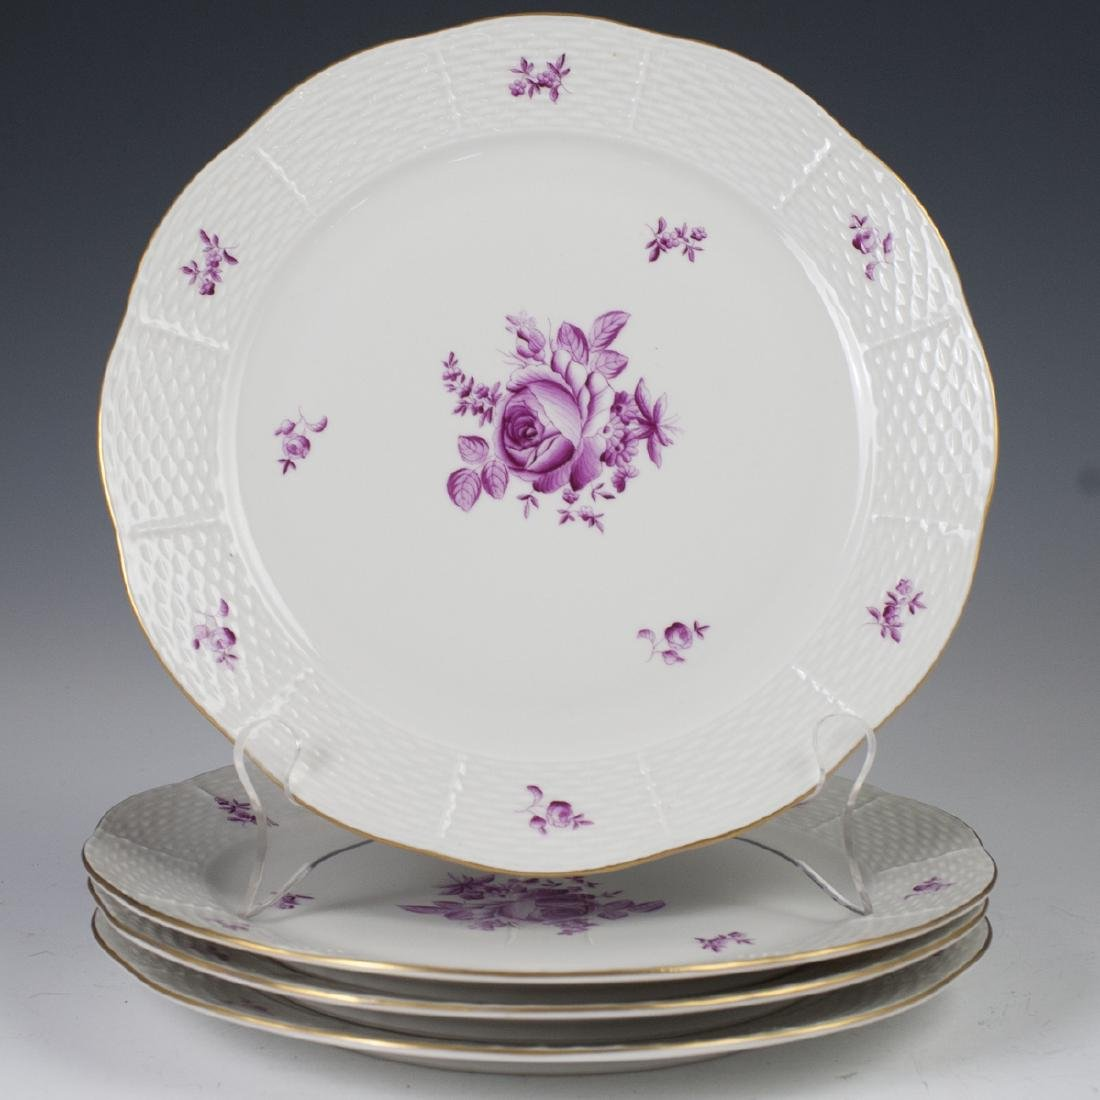 Herend Porcelain Dinner Plates